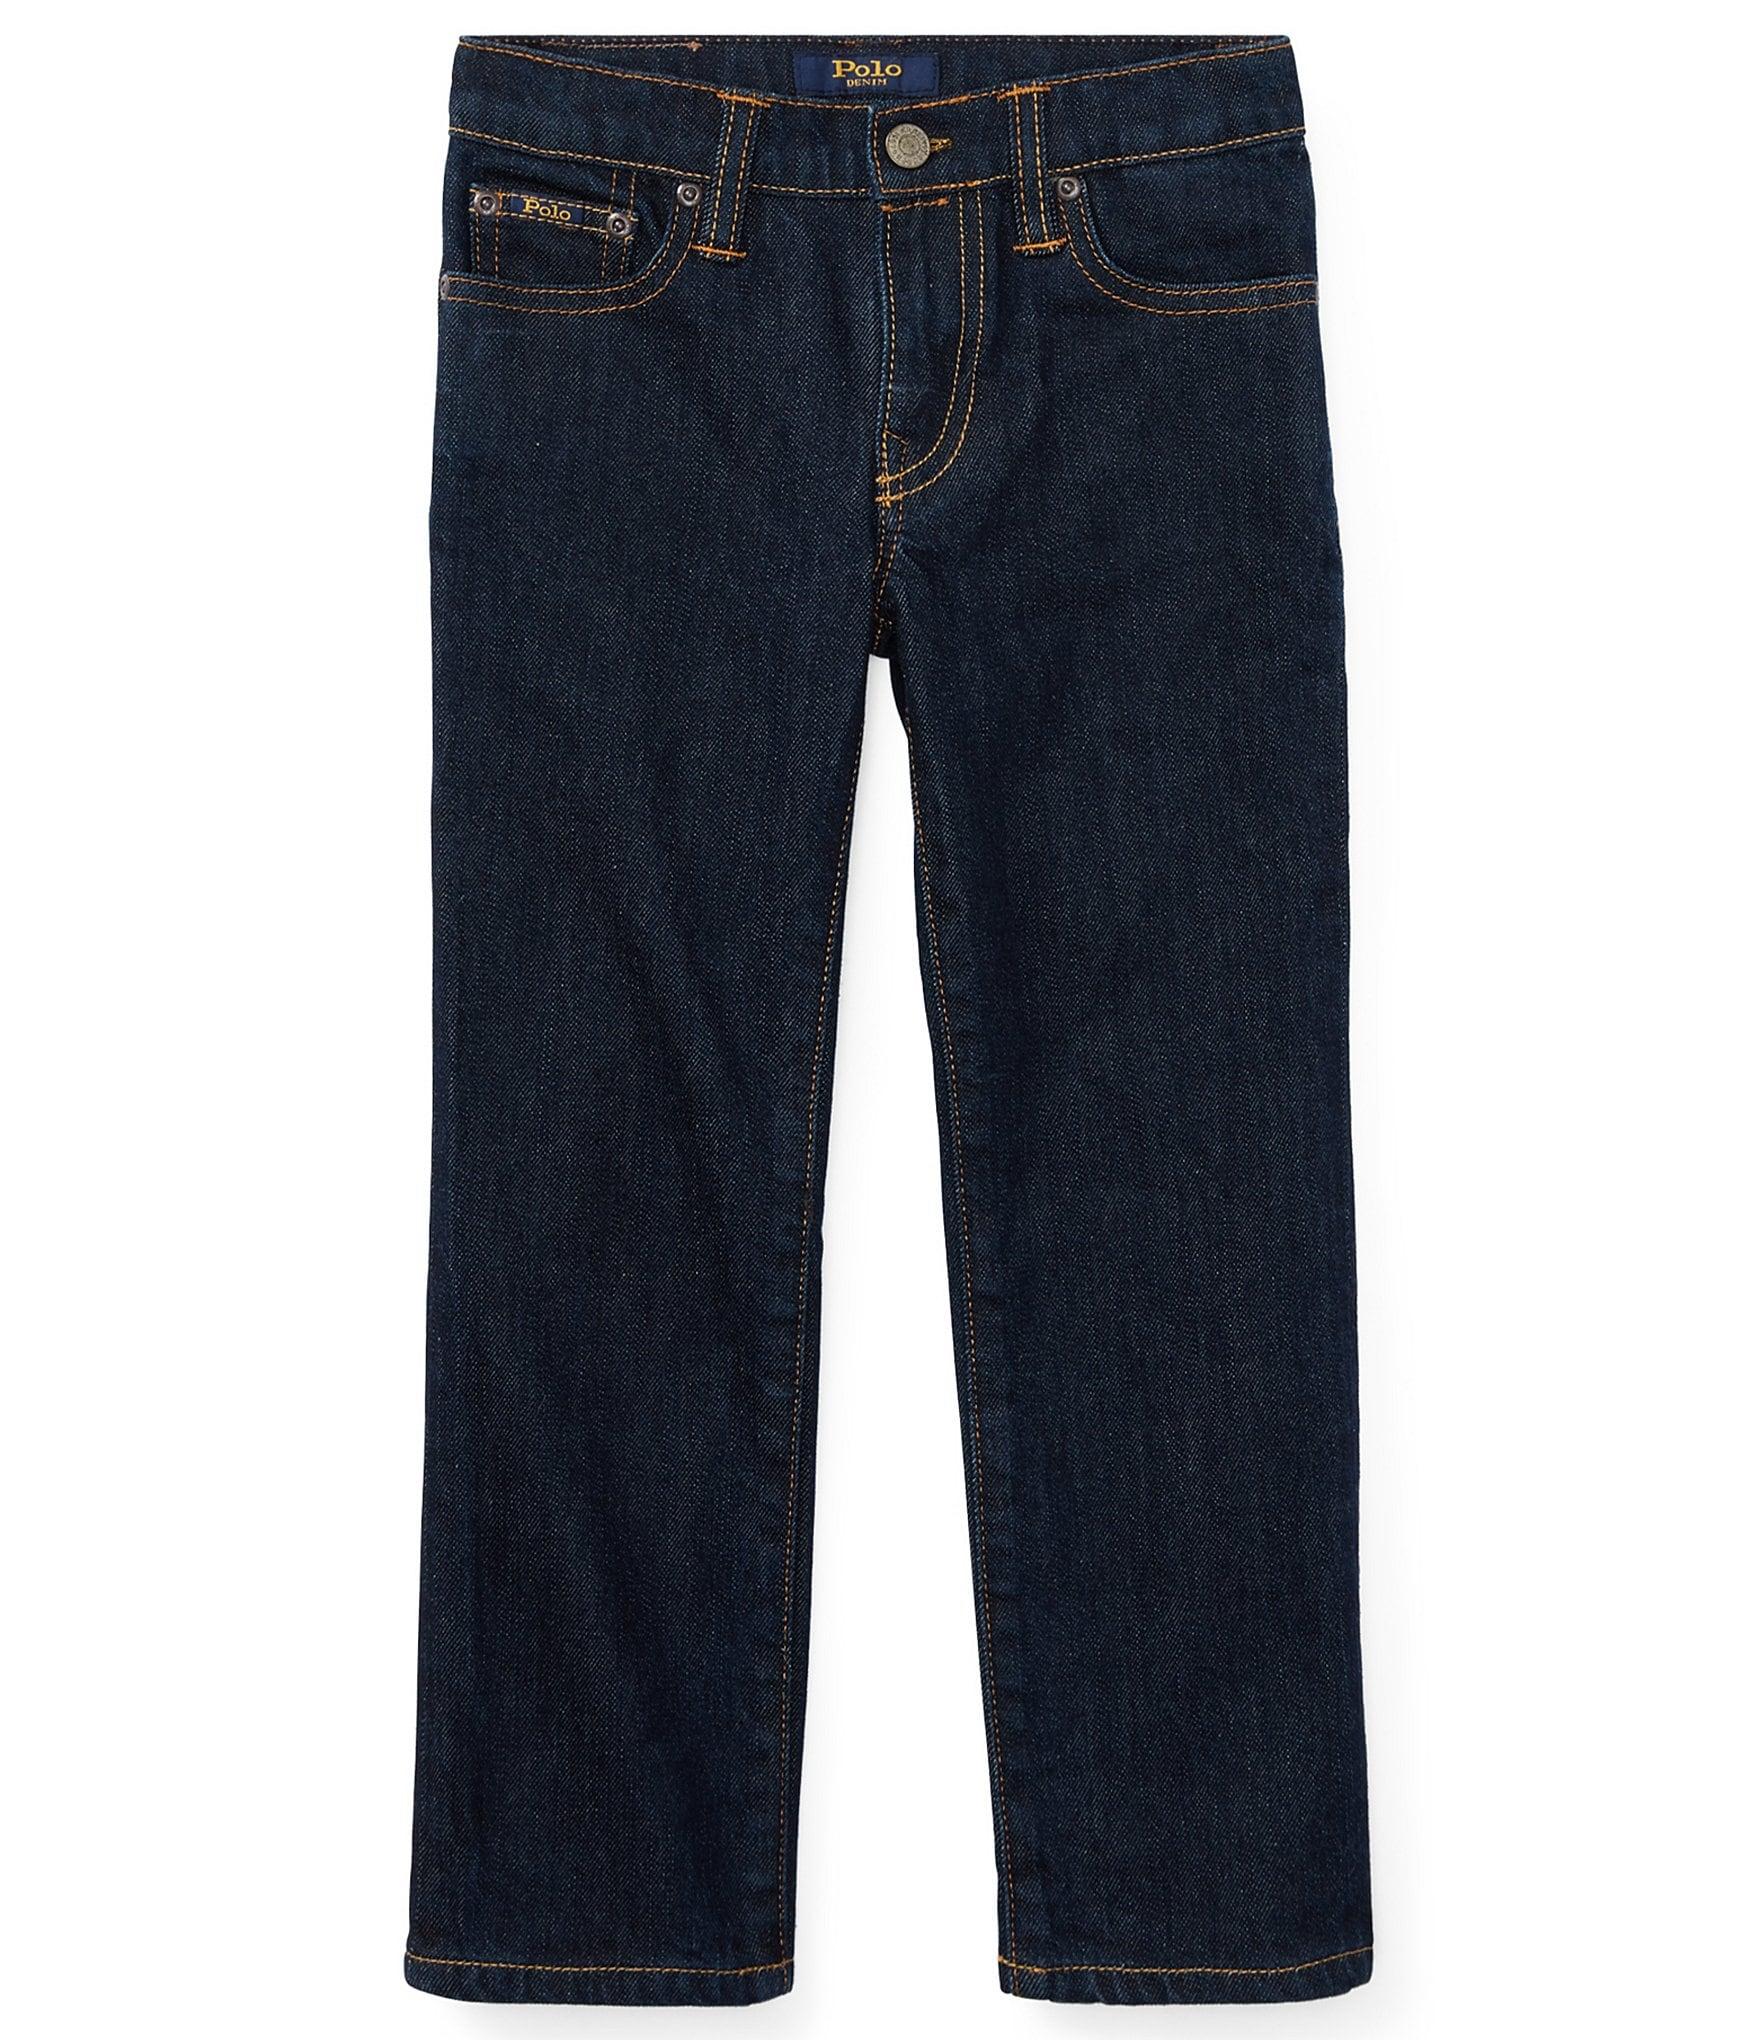 ae731aa58fd65 Ralph Lauren Boys' Jeans | Dillard's